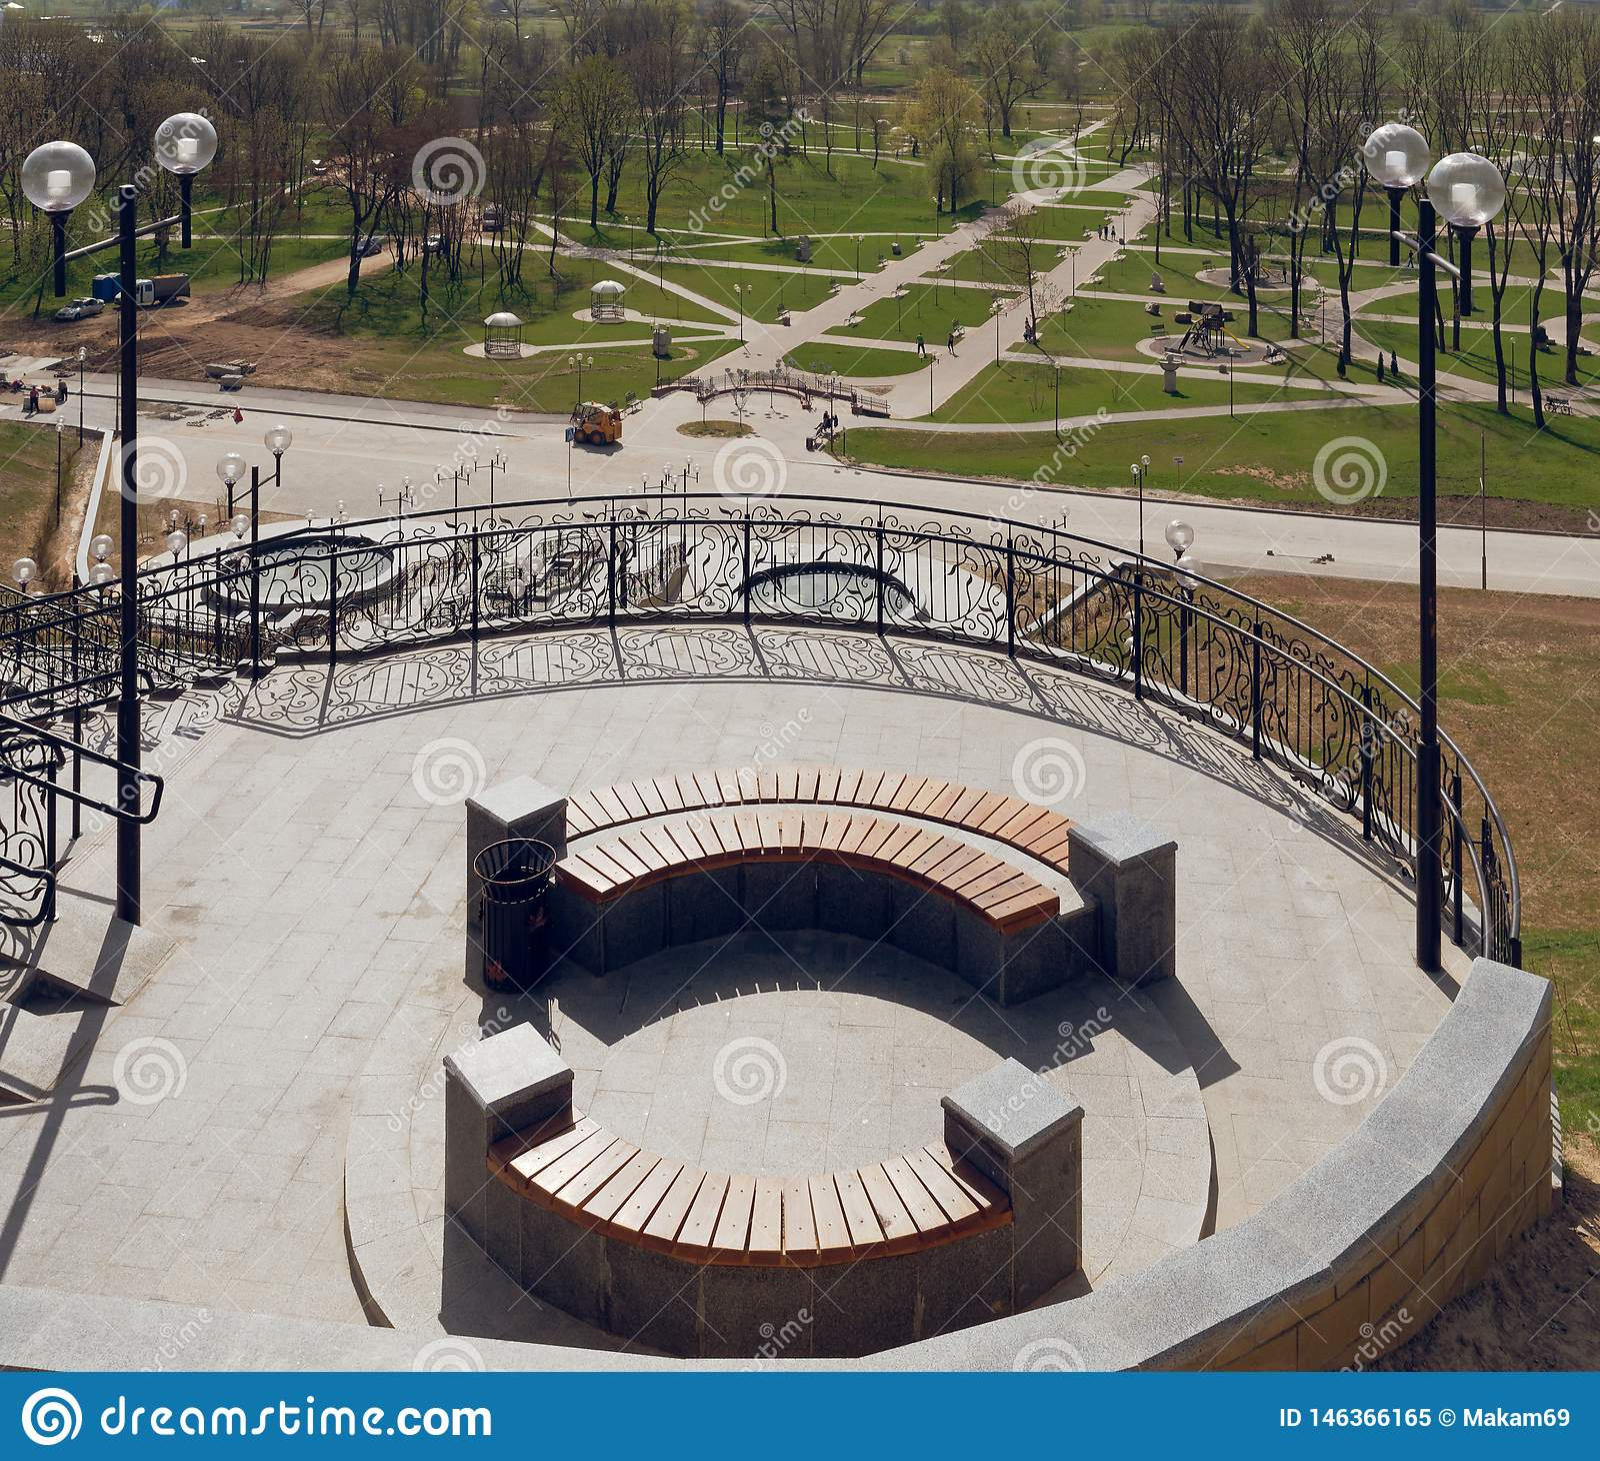 MOGILEV, ΛΕΥΚΟΡΩΣΙΑ - 27 ΑΠΡΙΛΊΟΥ 2019: περιοχή πάρκων με μια σκάλα και μια πηγή